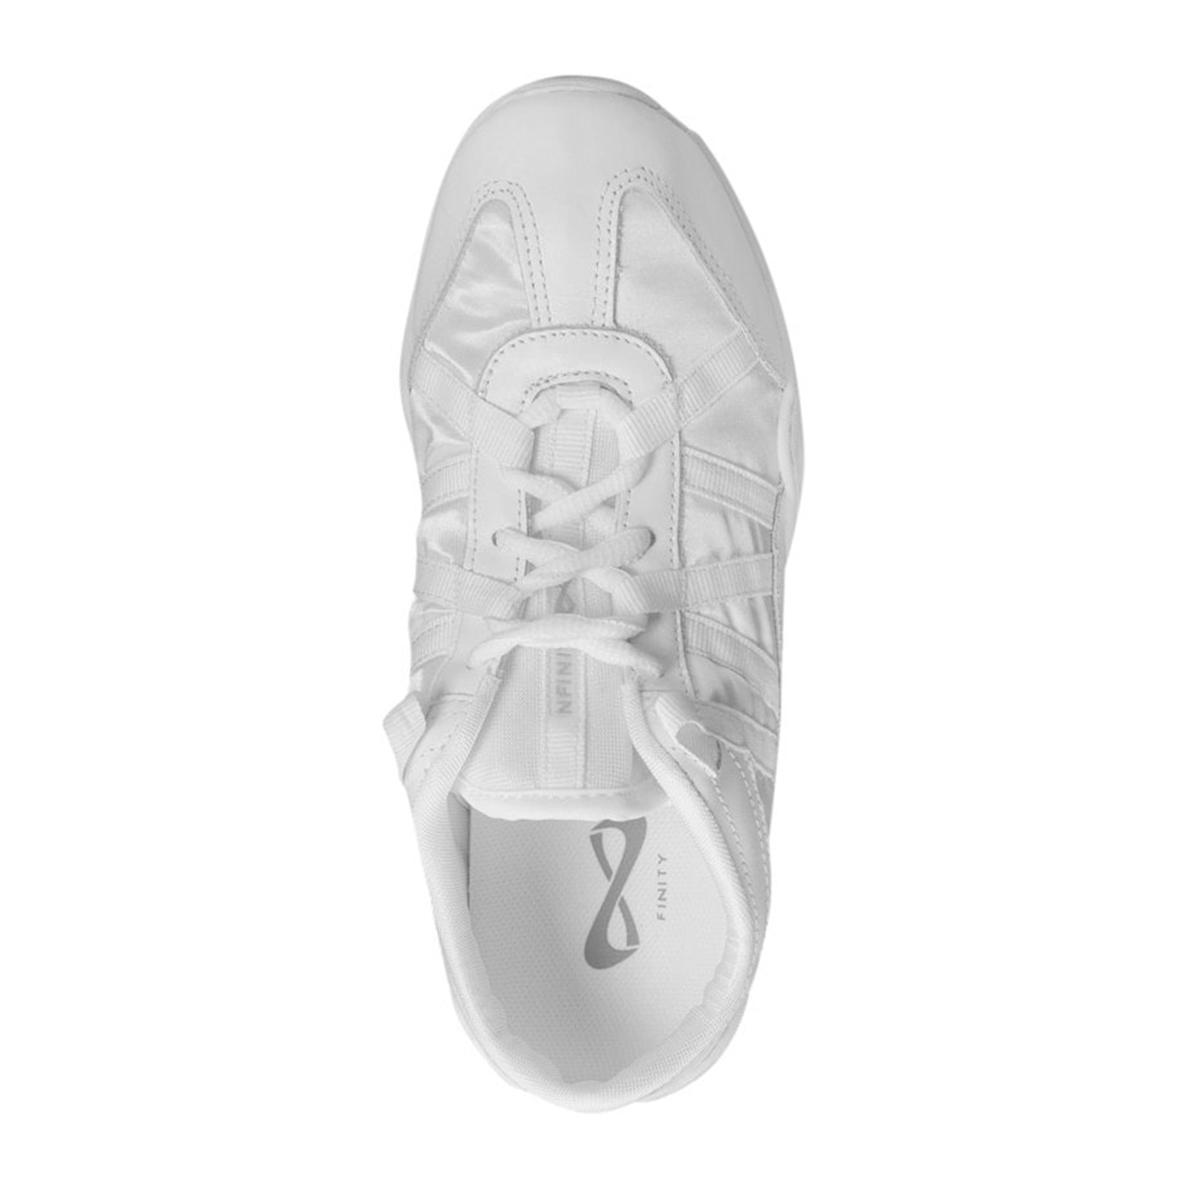 Nfinity Evolution Cheer Shoe